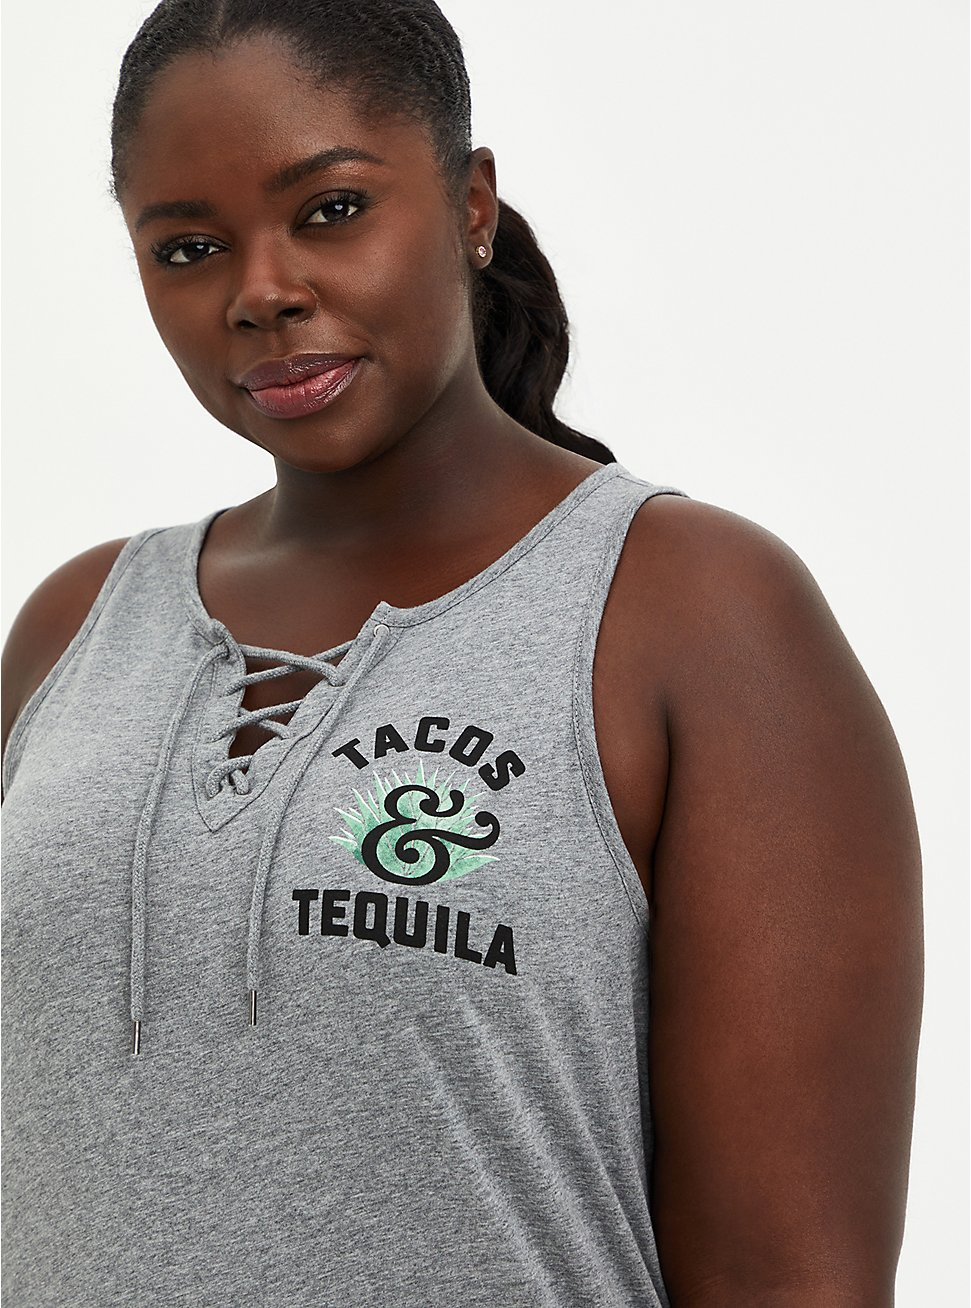 Lace Up Tank - Tacos & Tequila Grey, MEDIUM HEATHER GREY, hi-res